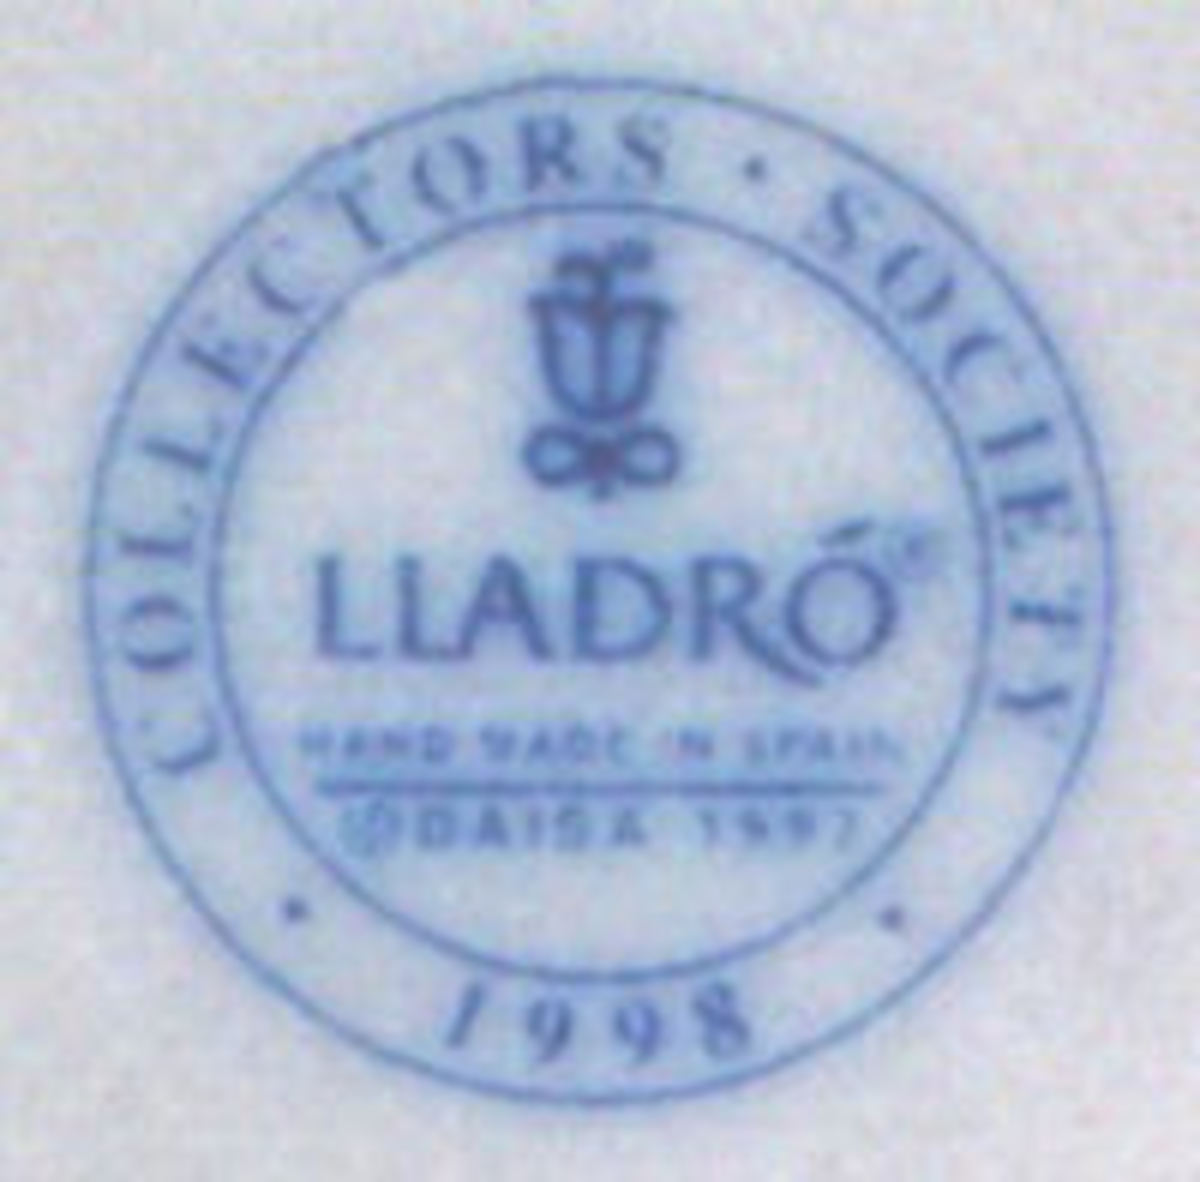 Collector's Society Mark